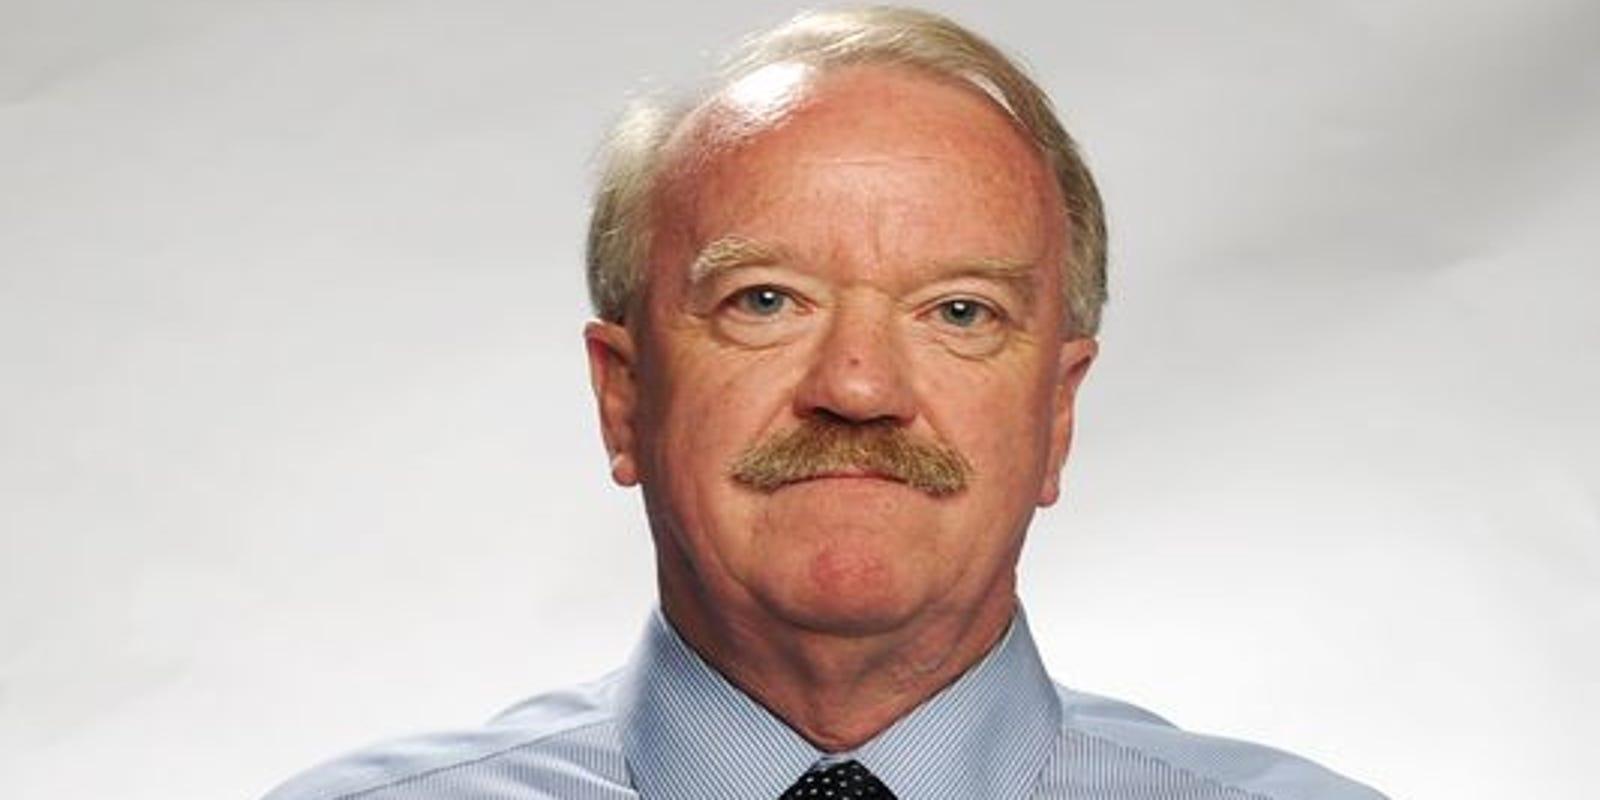 Legendary Tennessean sports columnist David Climer dies after battle with cancer